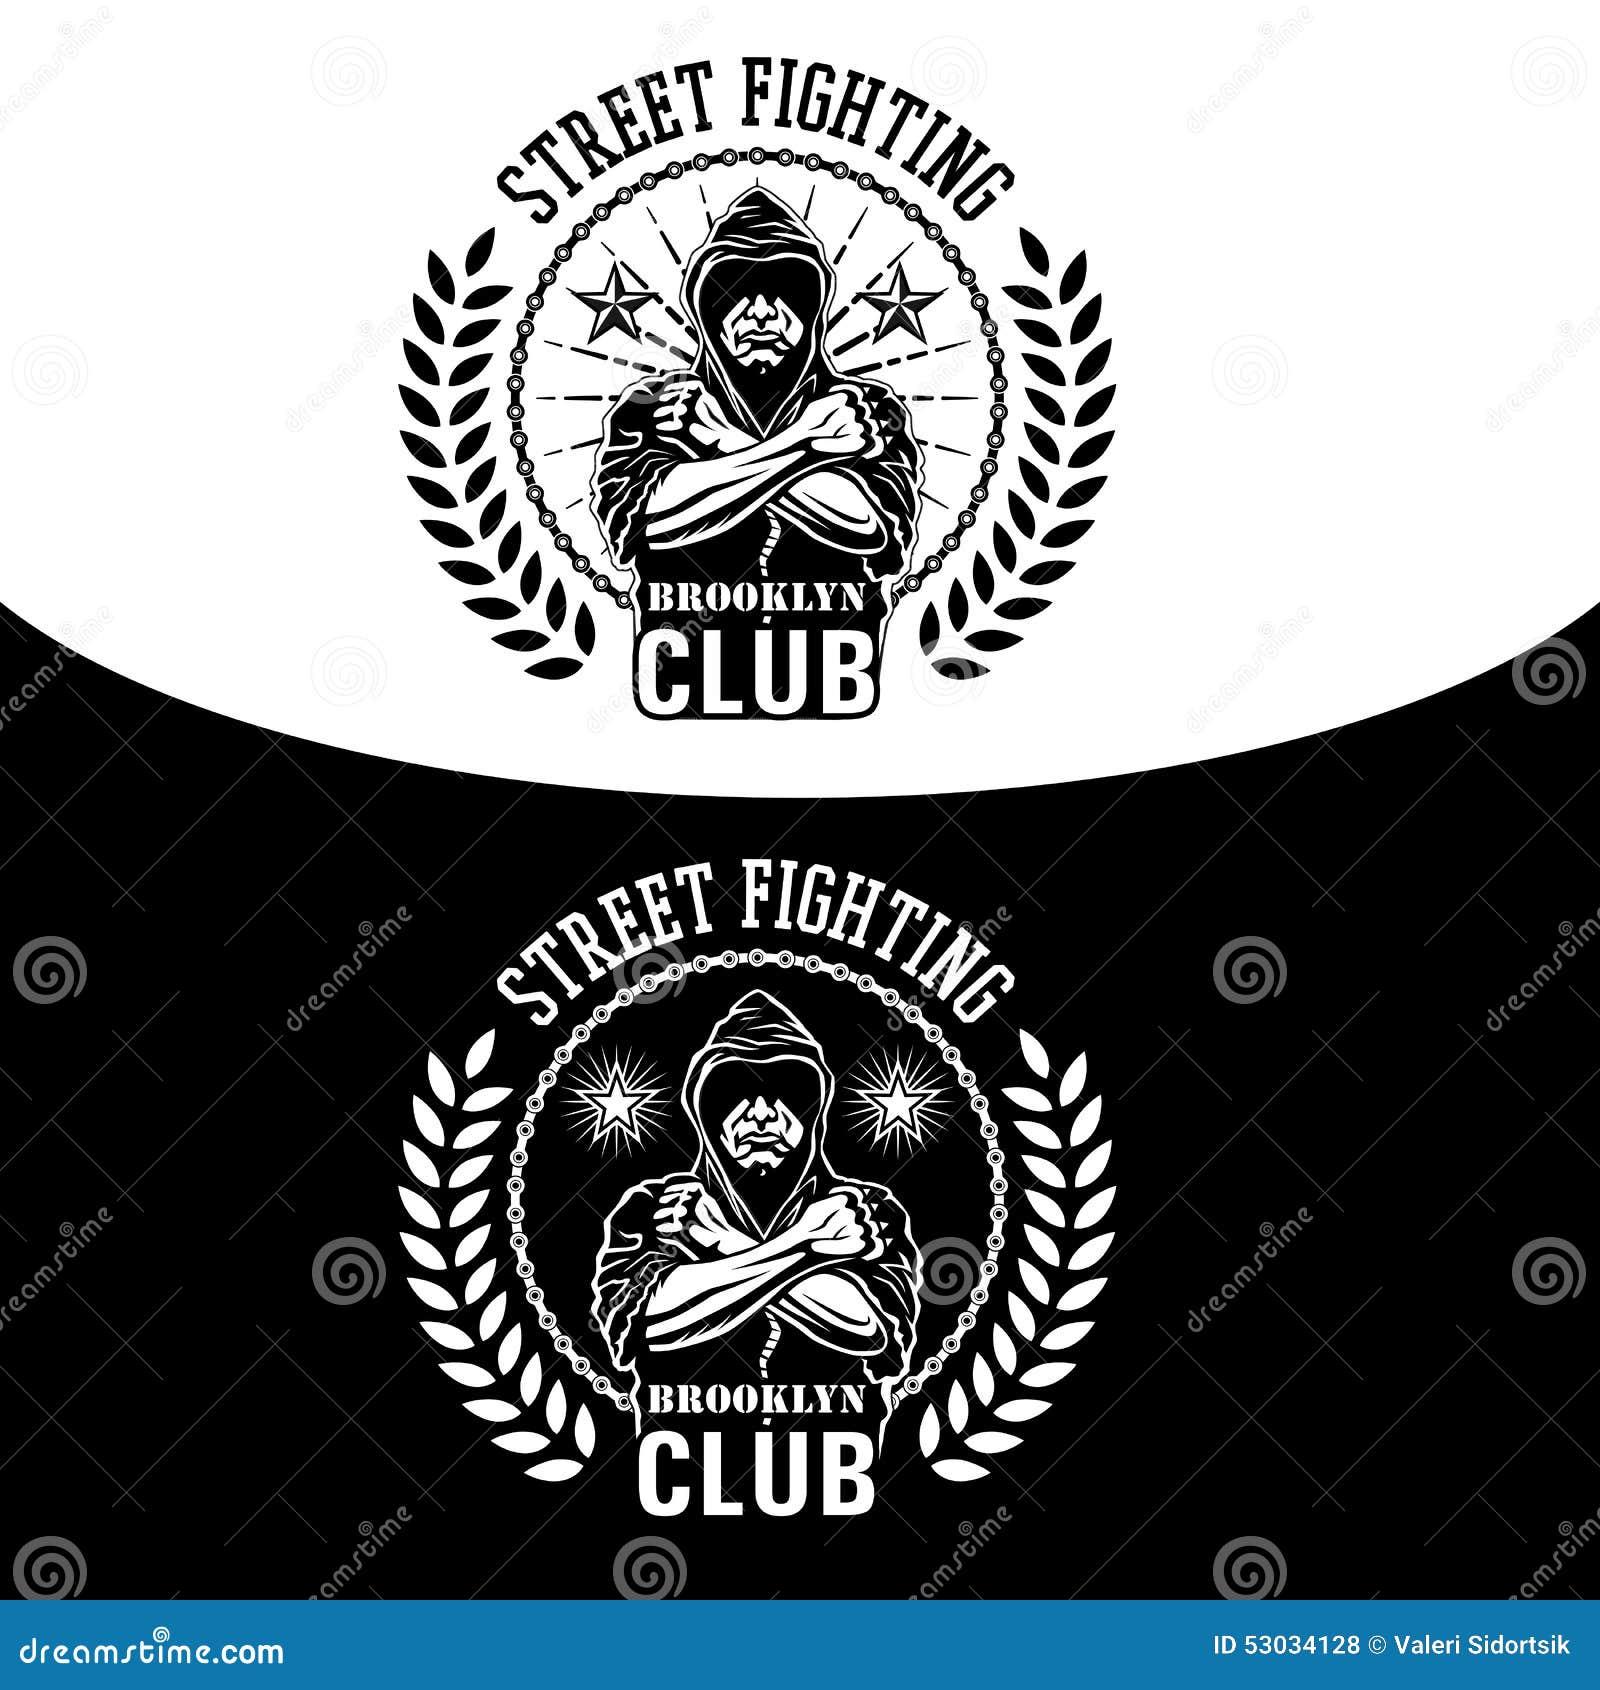 Street Fight Emblem Stock Vector Illustration Of Emblem 53034128